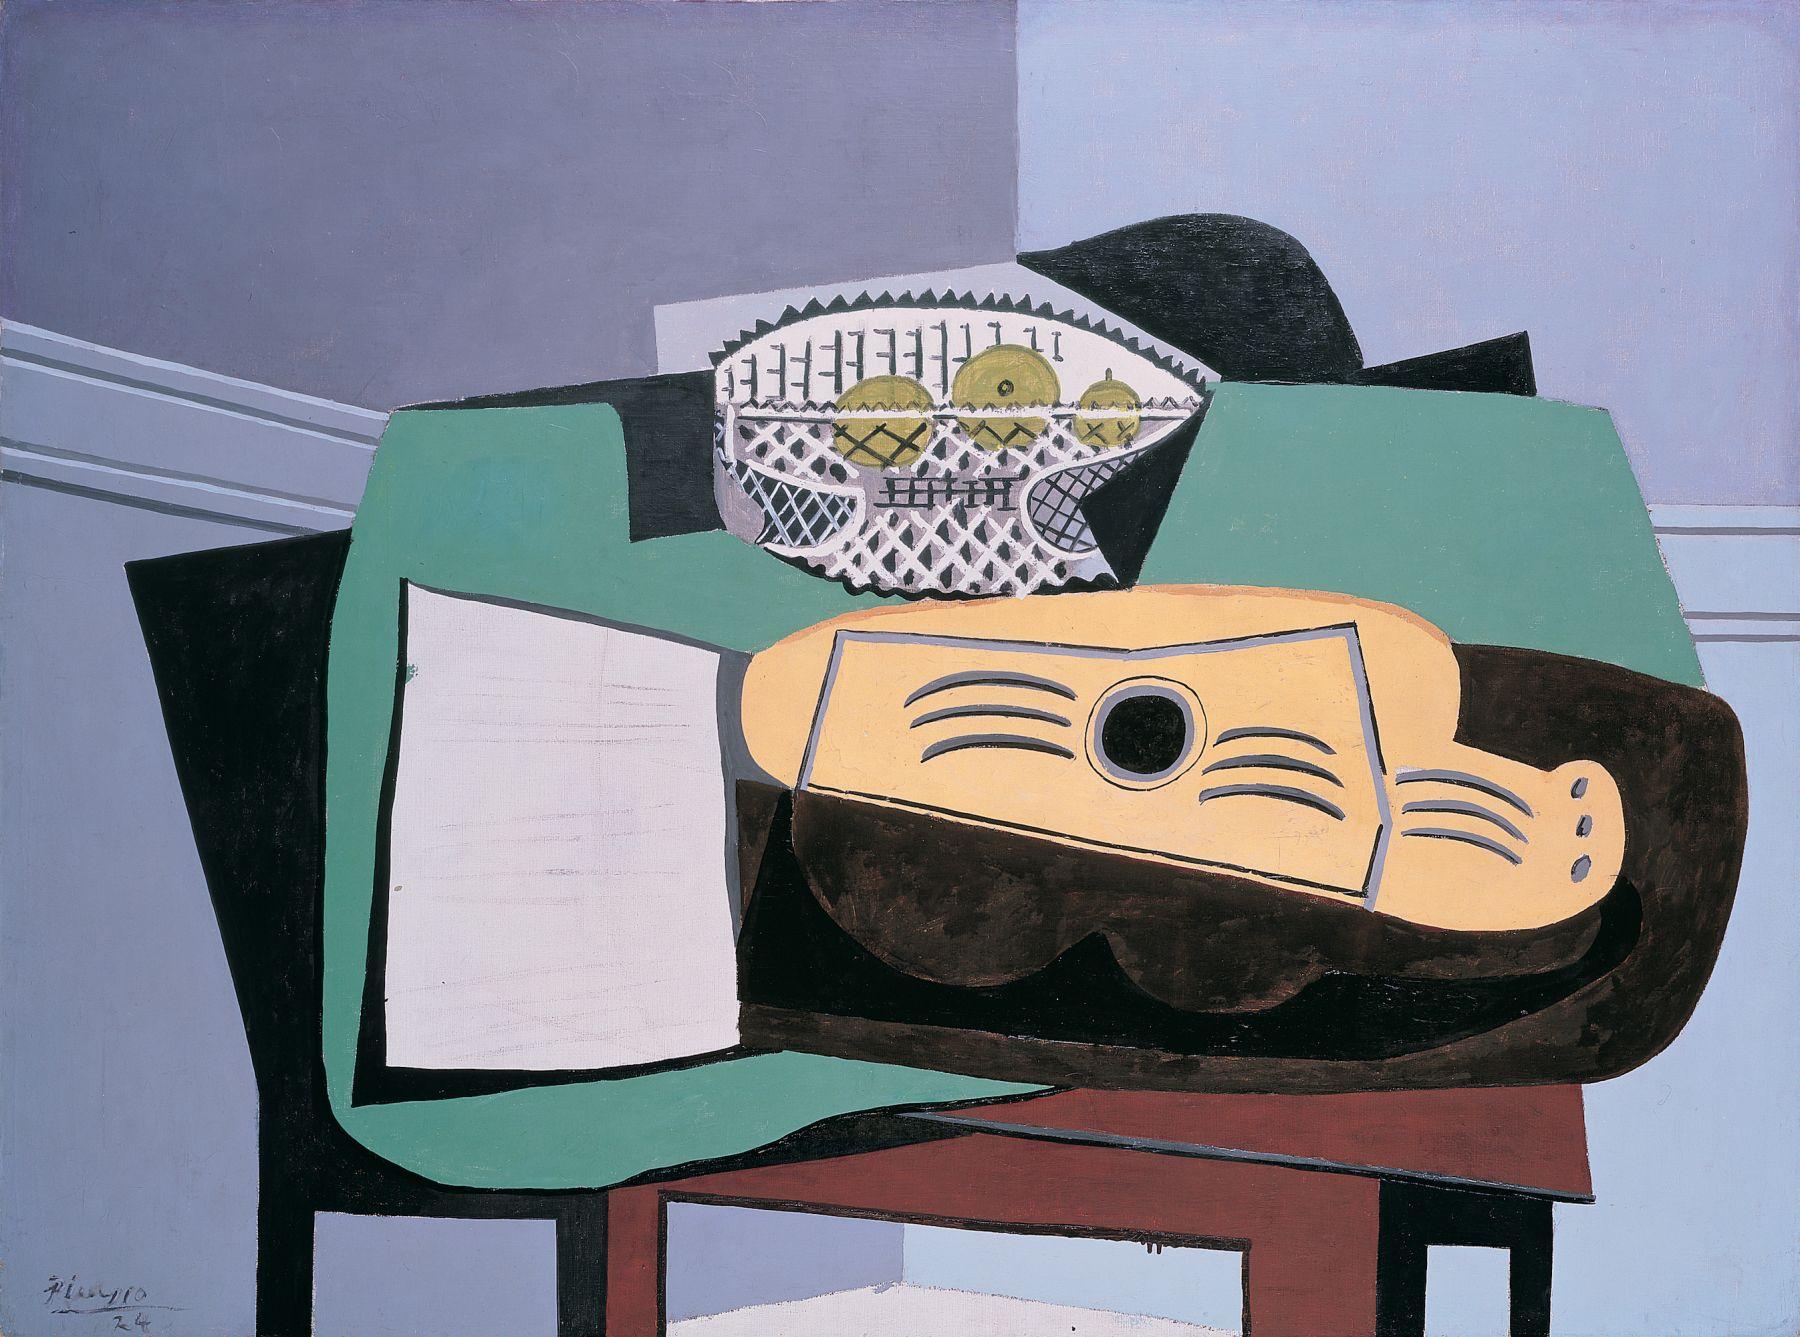 Pablo Picasso, Partition, Guitare, Compotier, 1924 Oil on canvas 97.1 x 130.1 cm. (38 1/4 x 51 1/4 in.)